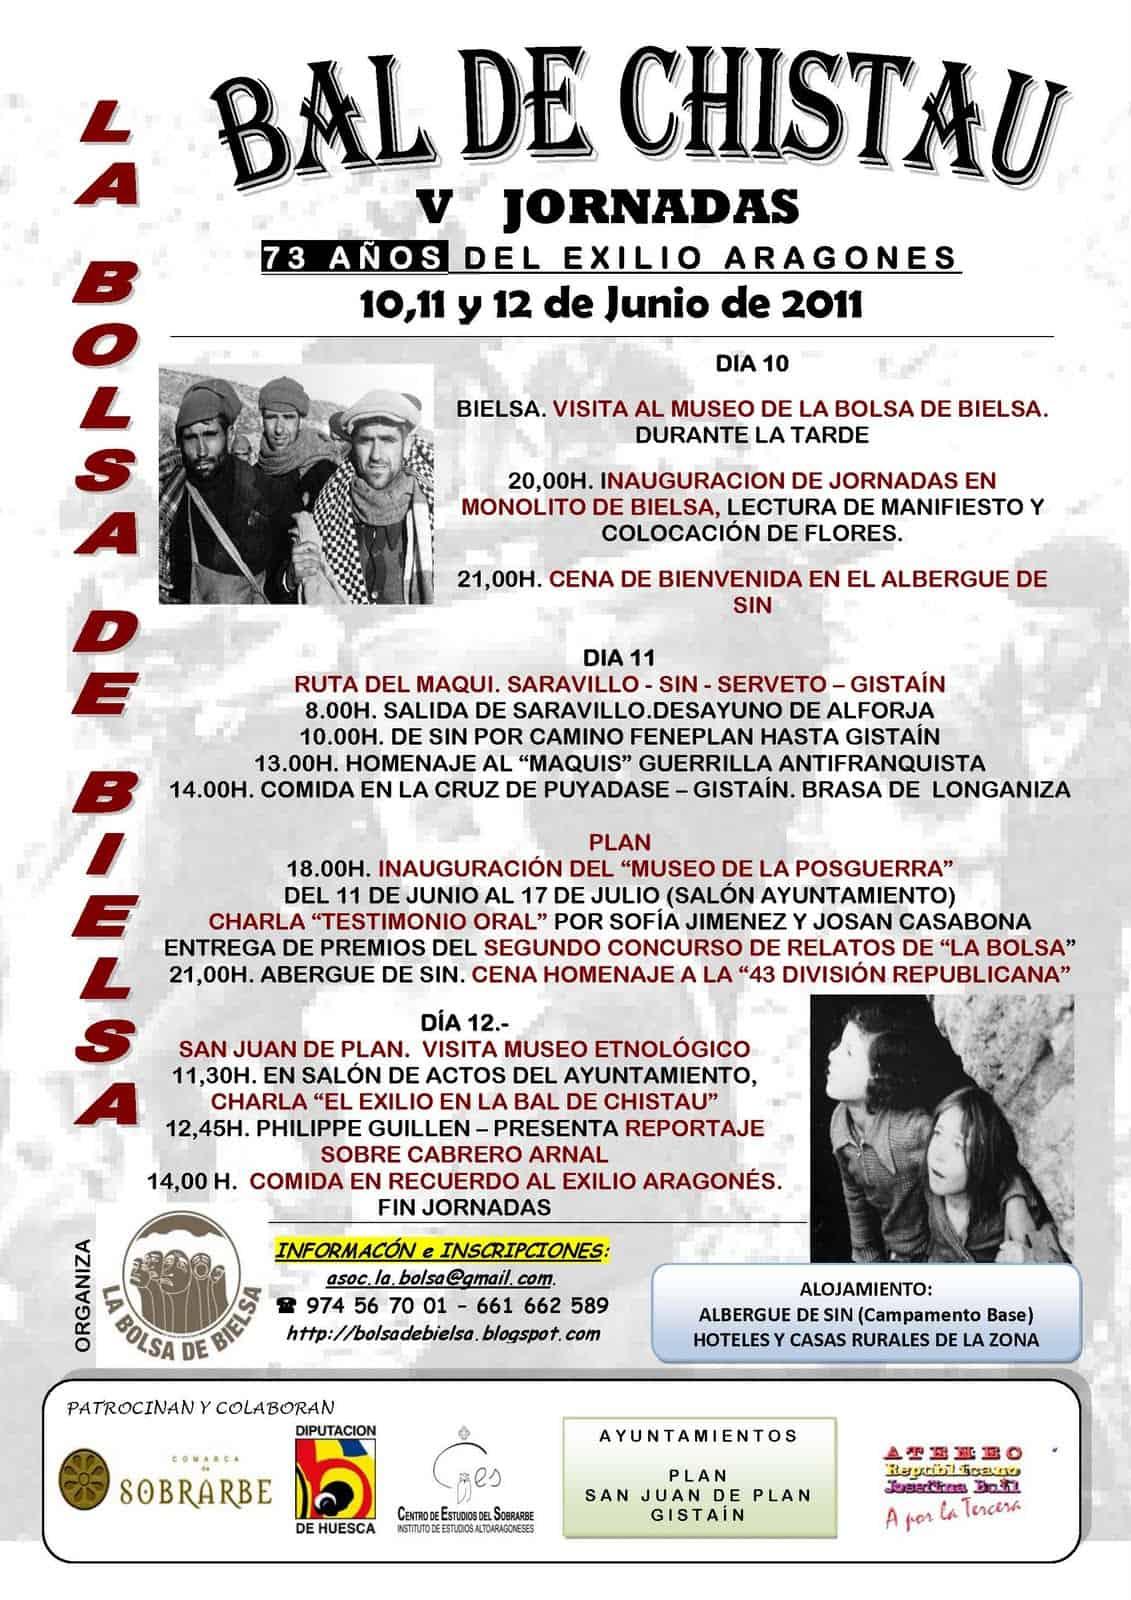 CARTEL 1 LA BOLSA DE BIELSA-BAL DE CHISTAU 04-05-2011.jpg